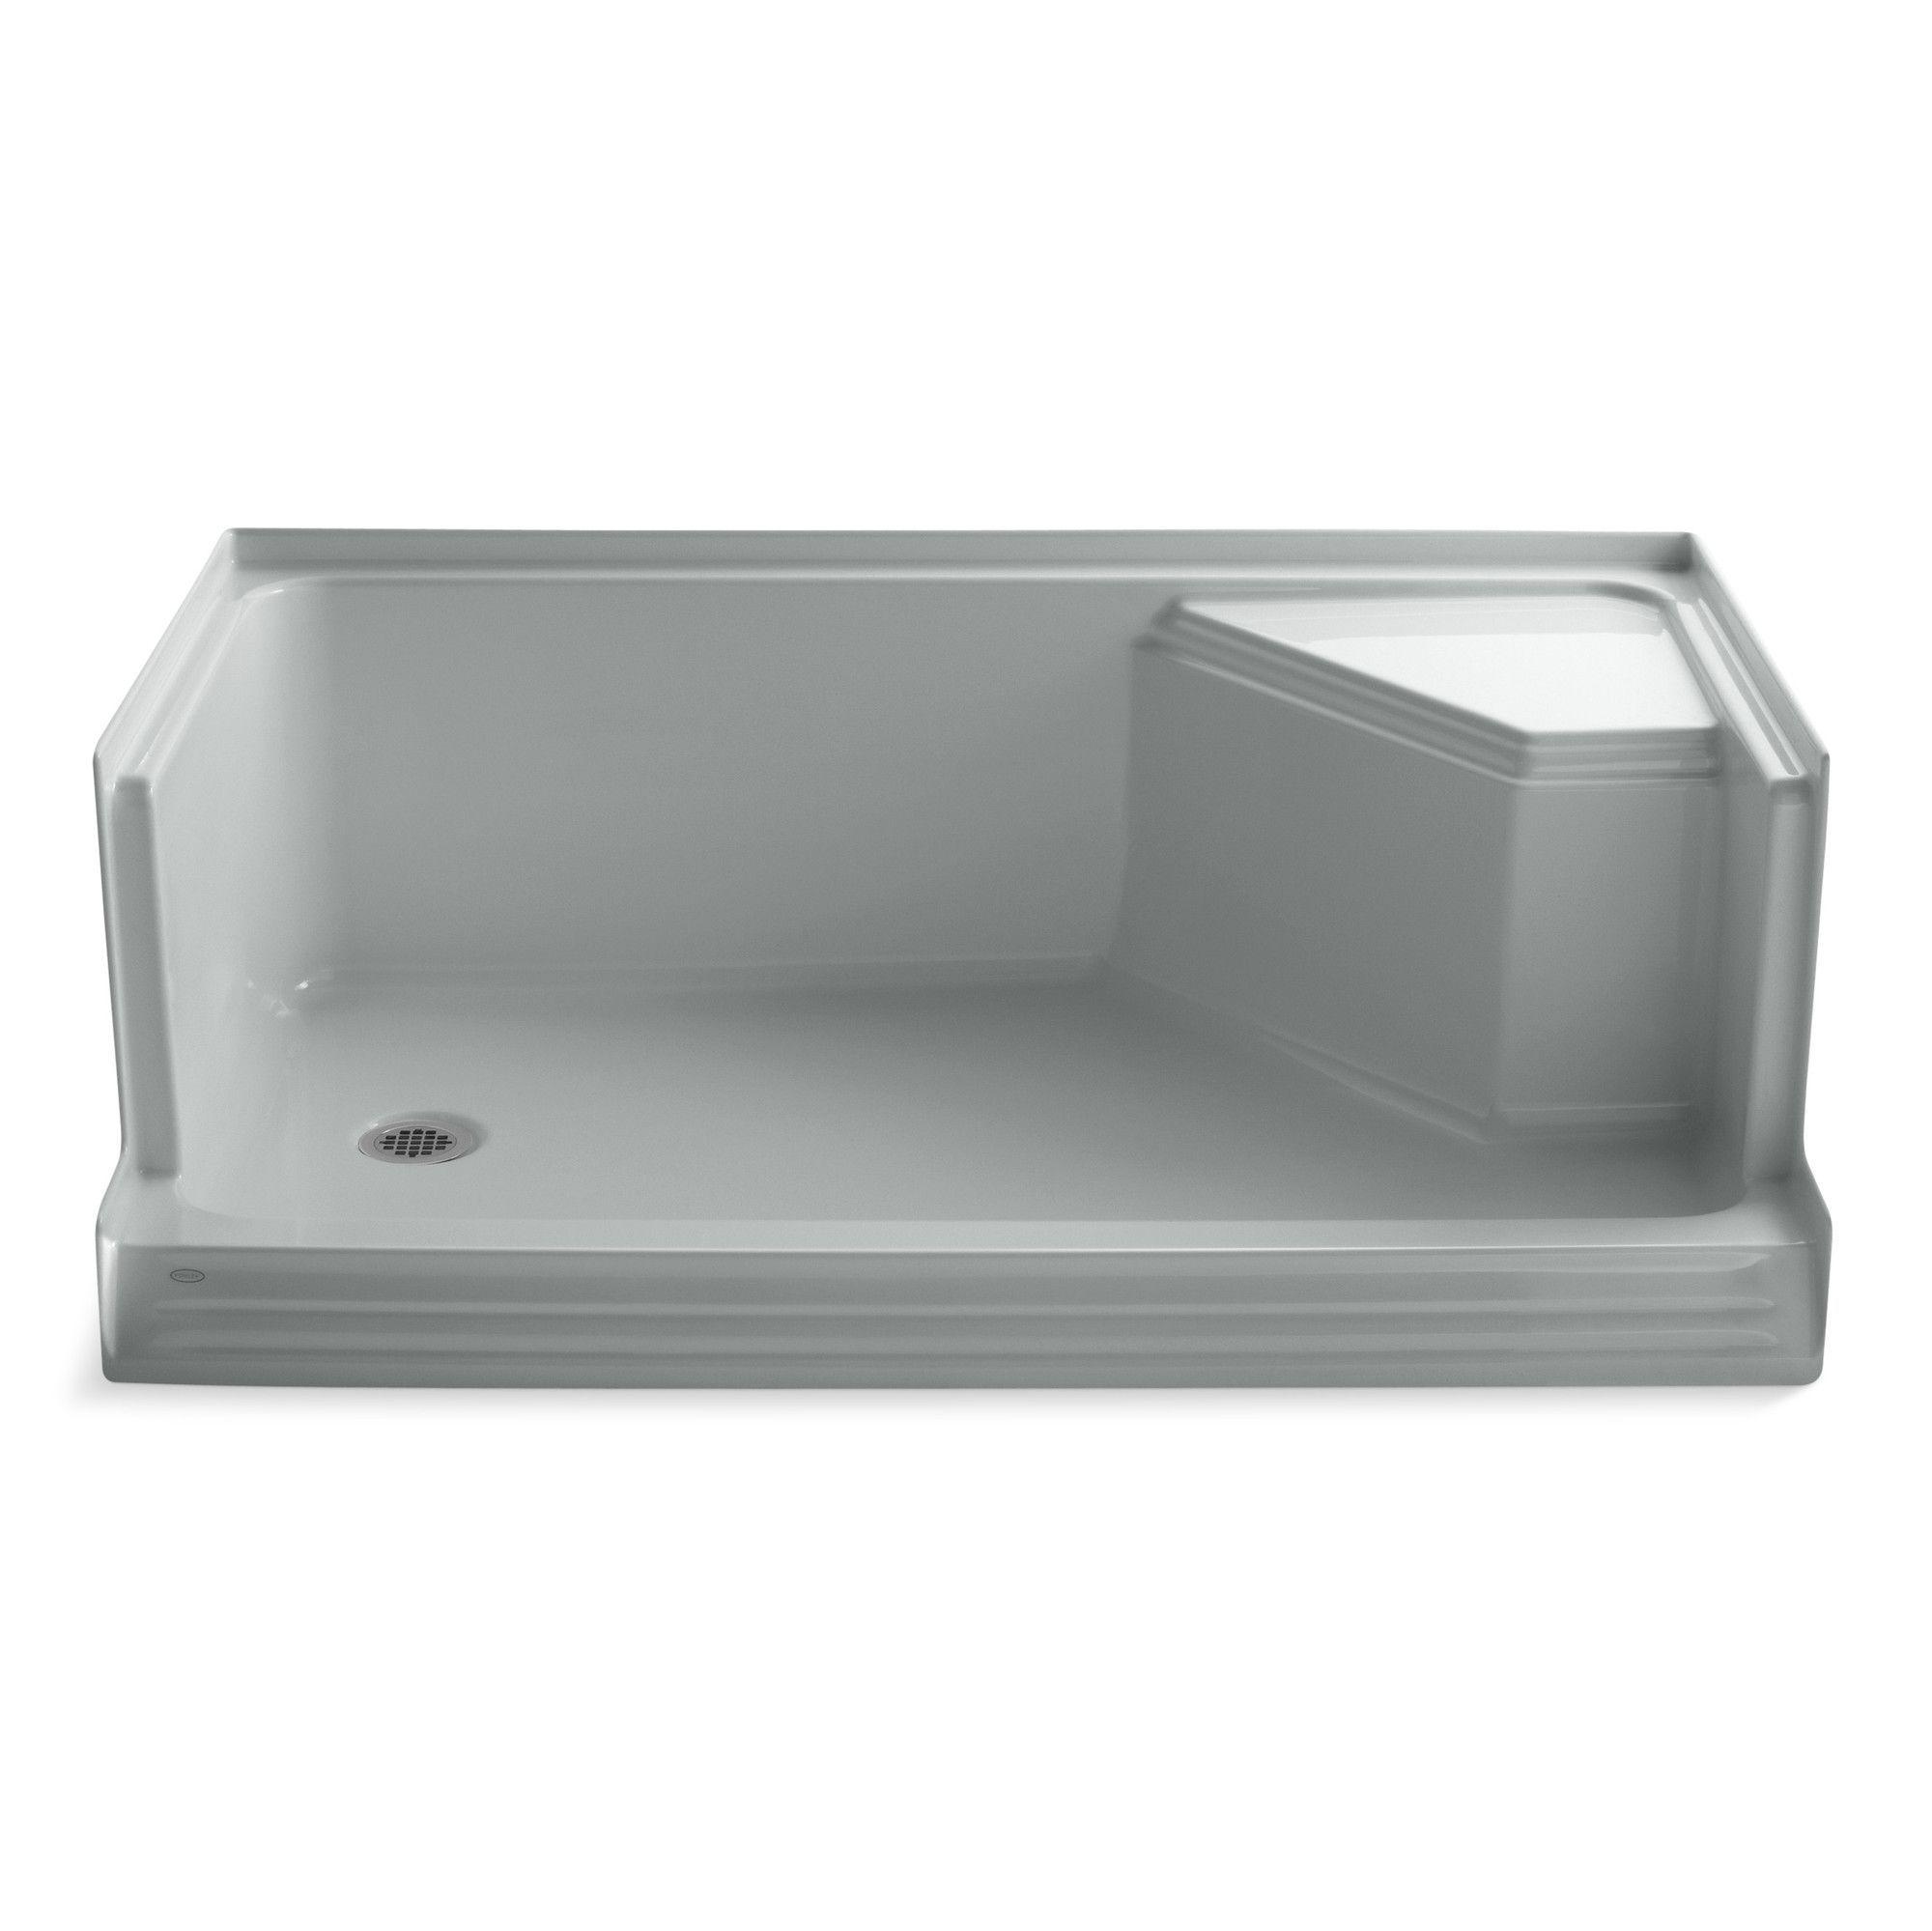 Memoirs 60 X 36 Single Threshold Left Hand Drain Shower Base